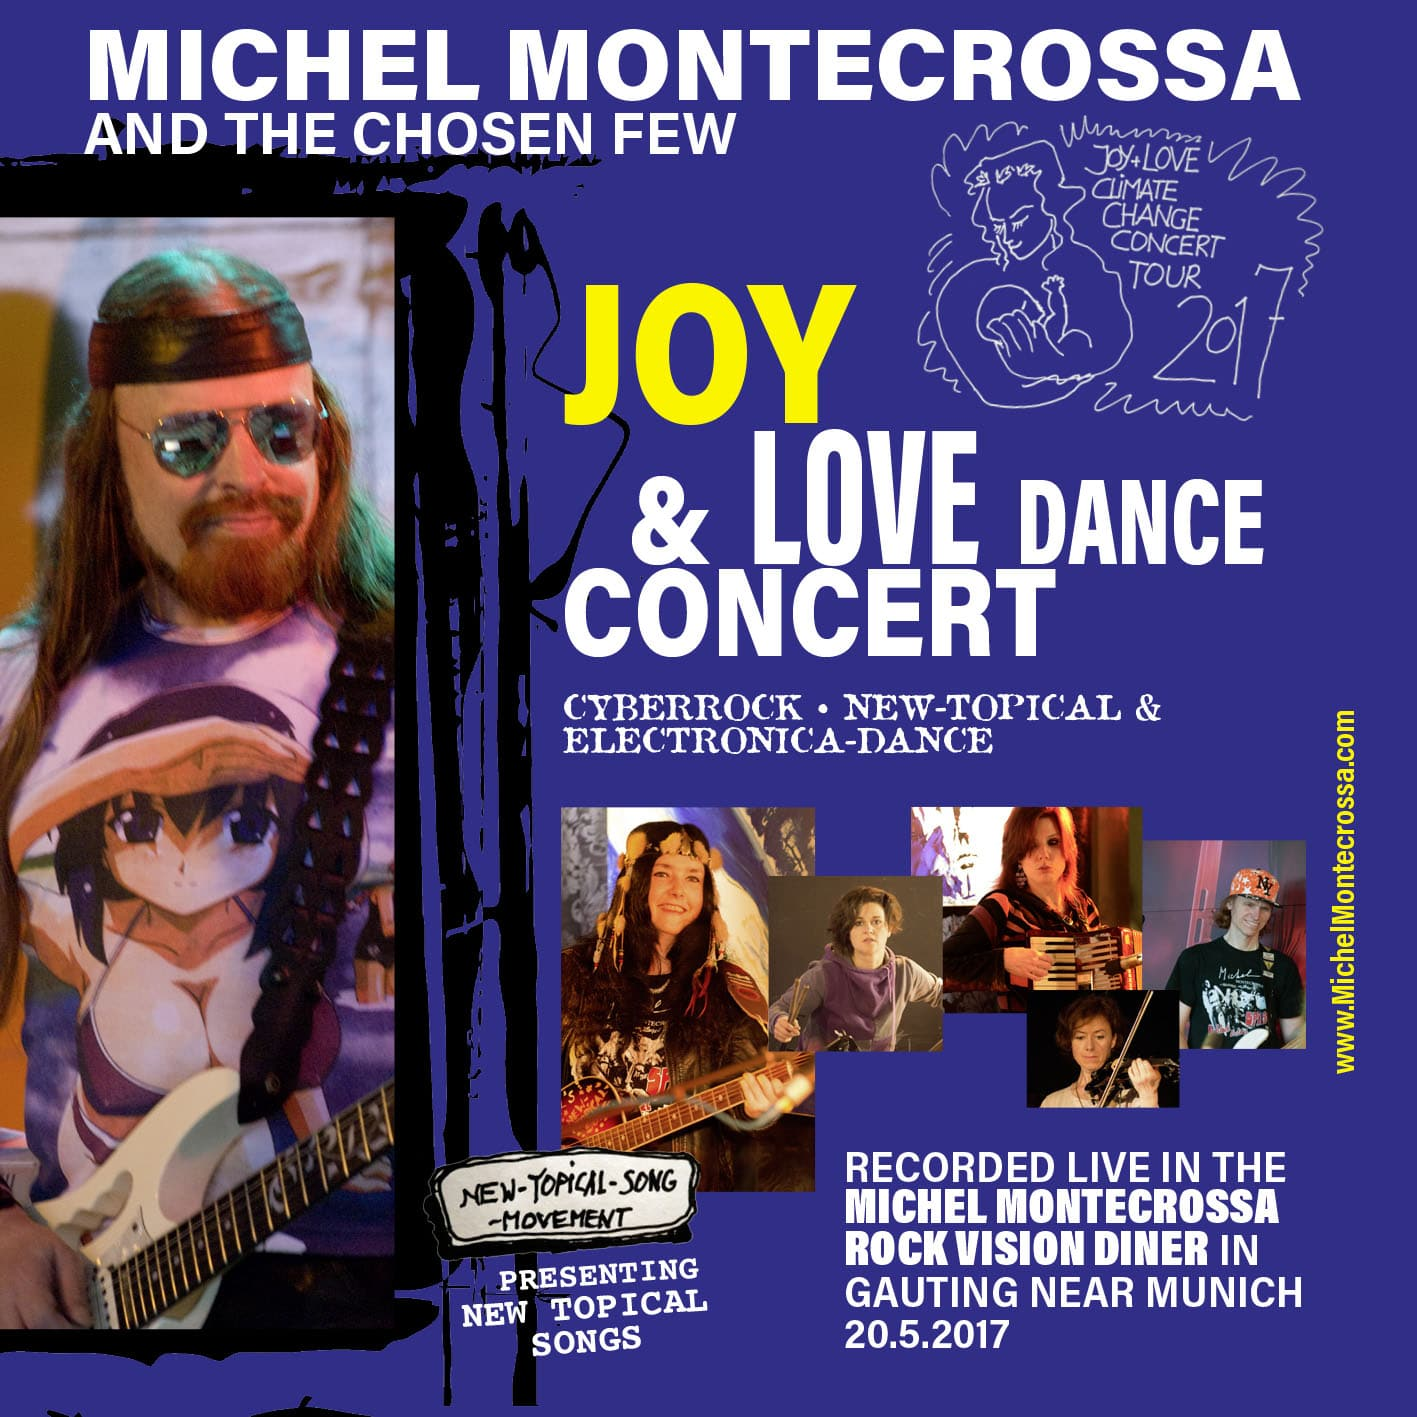 Joy & Love Dance Concert